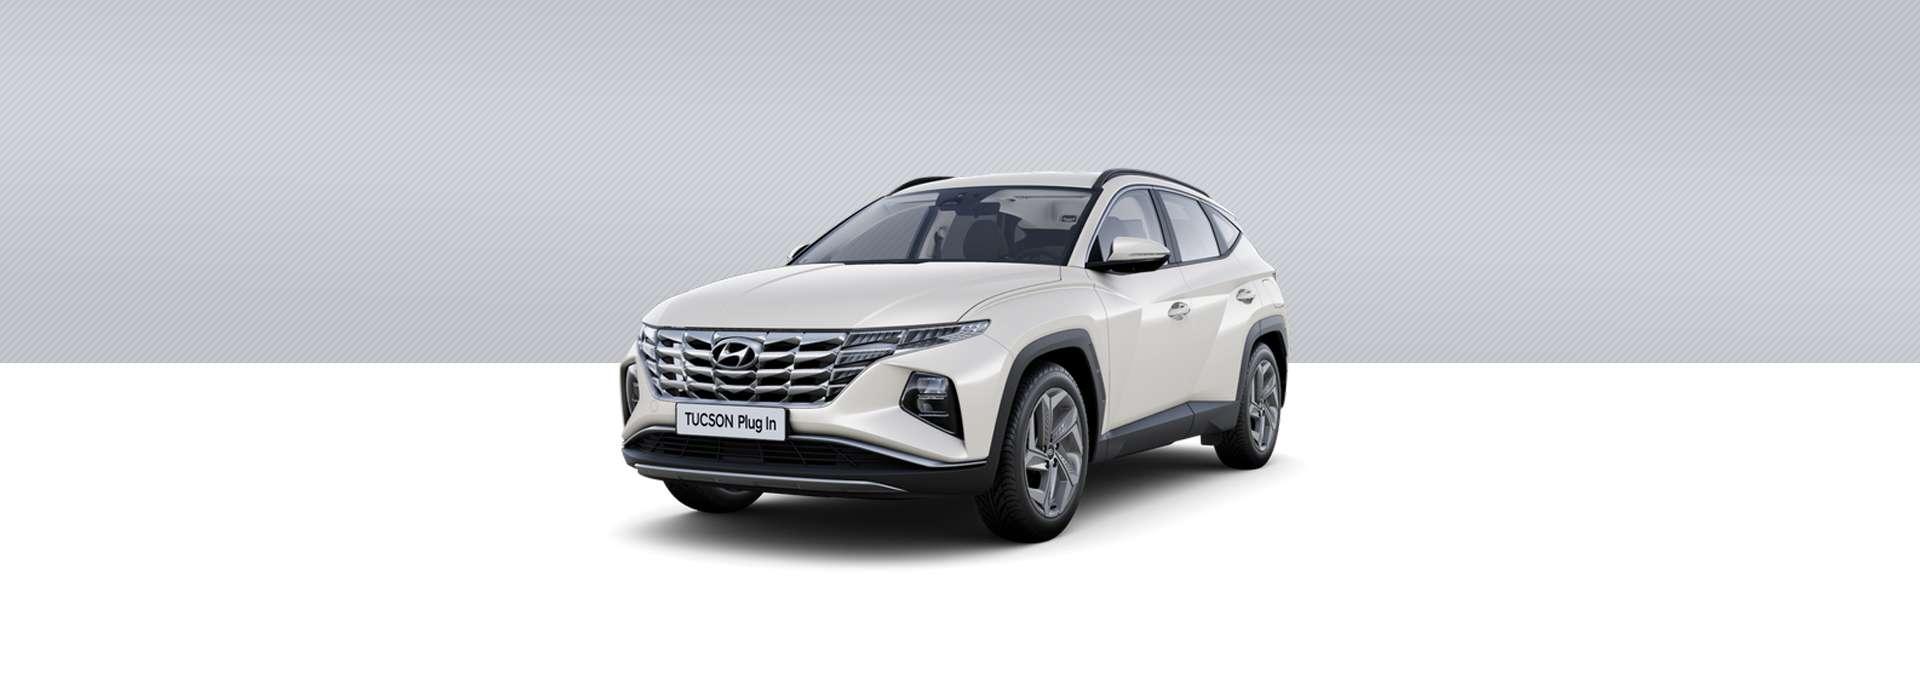 Hyundai Nuevo Tucson Híbrido Enchufable